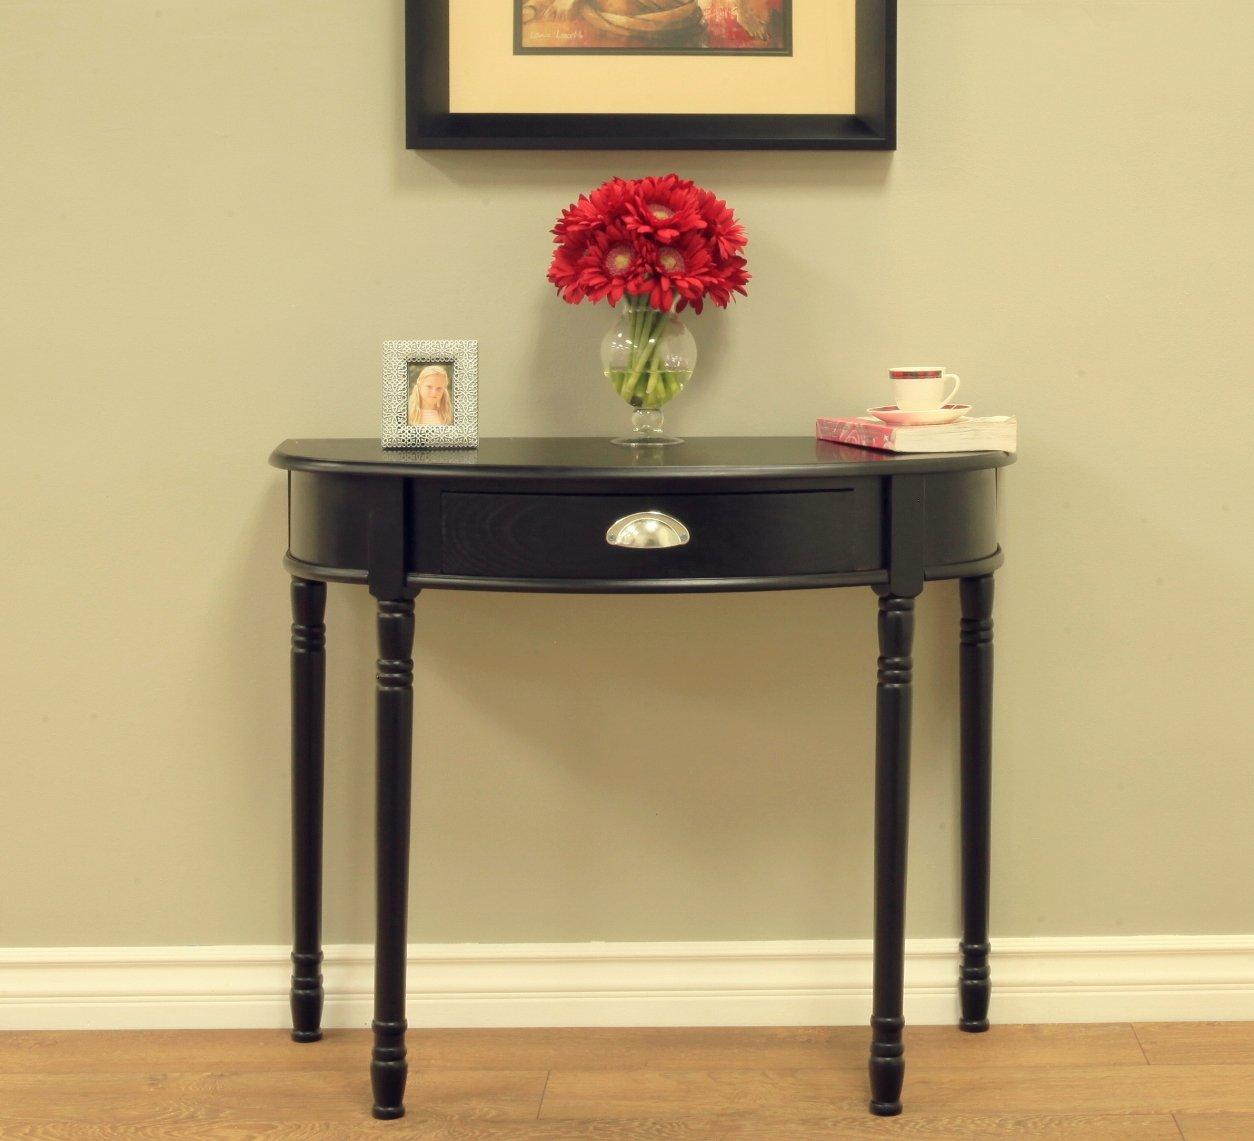 Amazon.com: Frenchi Home Furnishing Consola mesa de sofá con ...